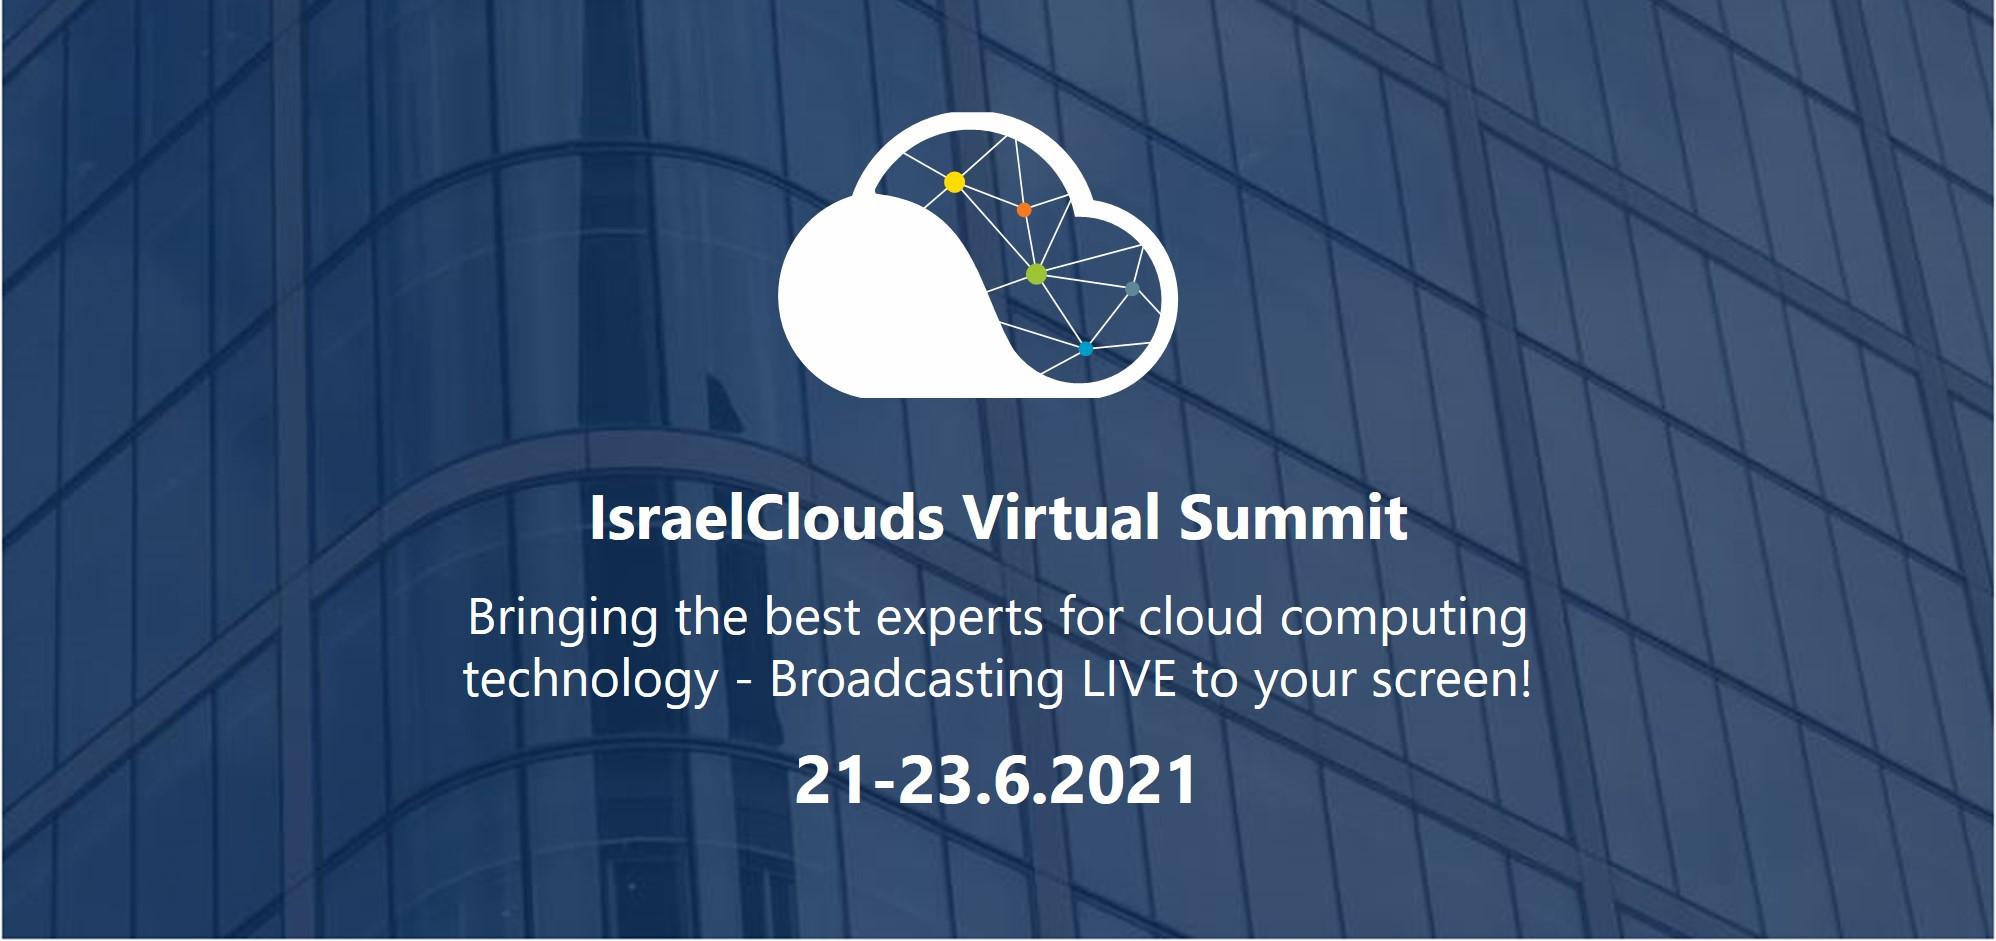 IsraelClouds Virtual Summit